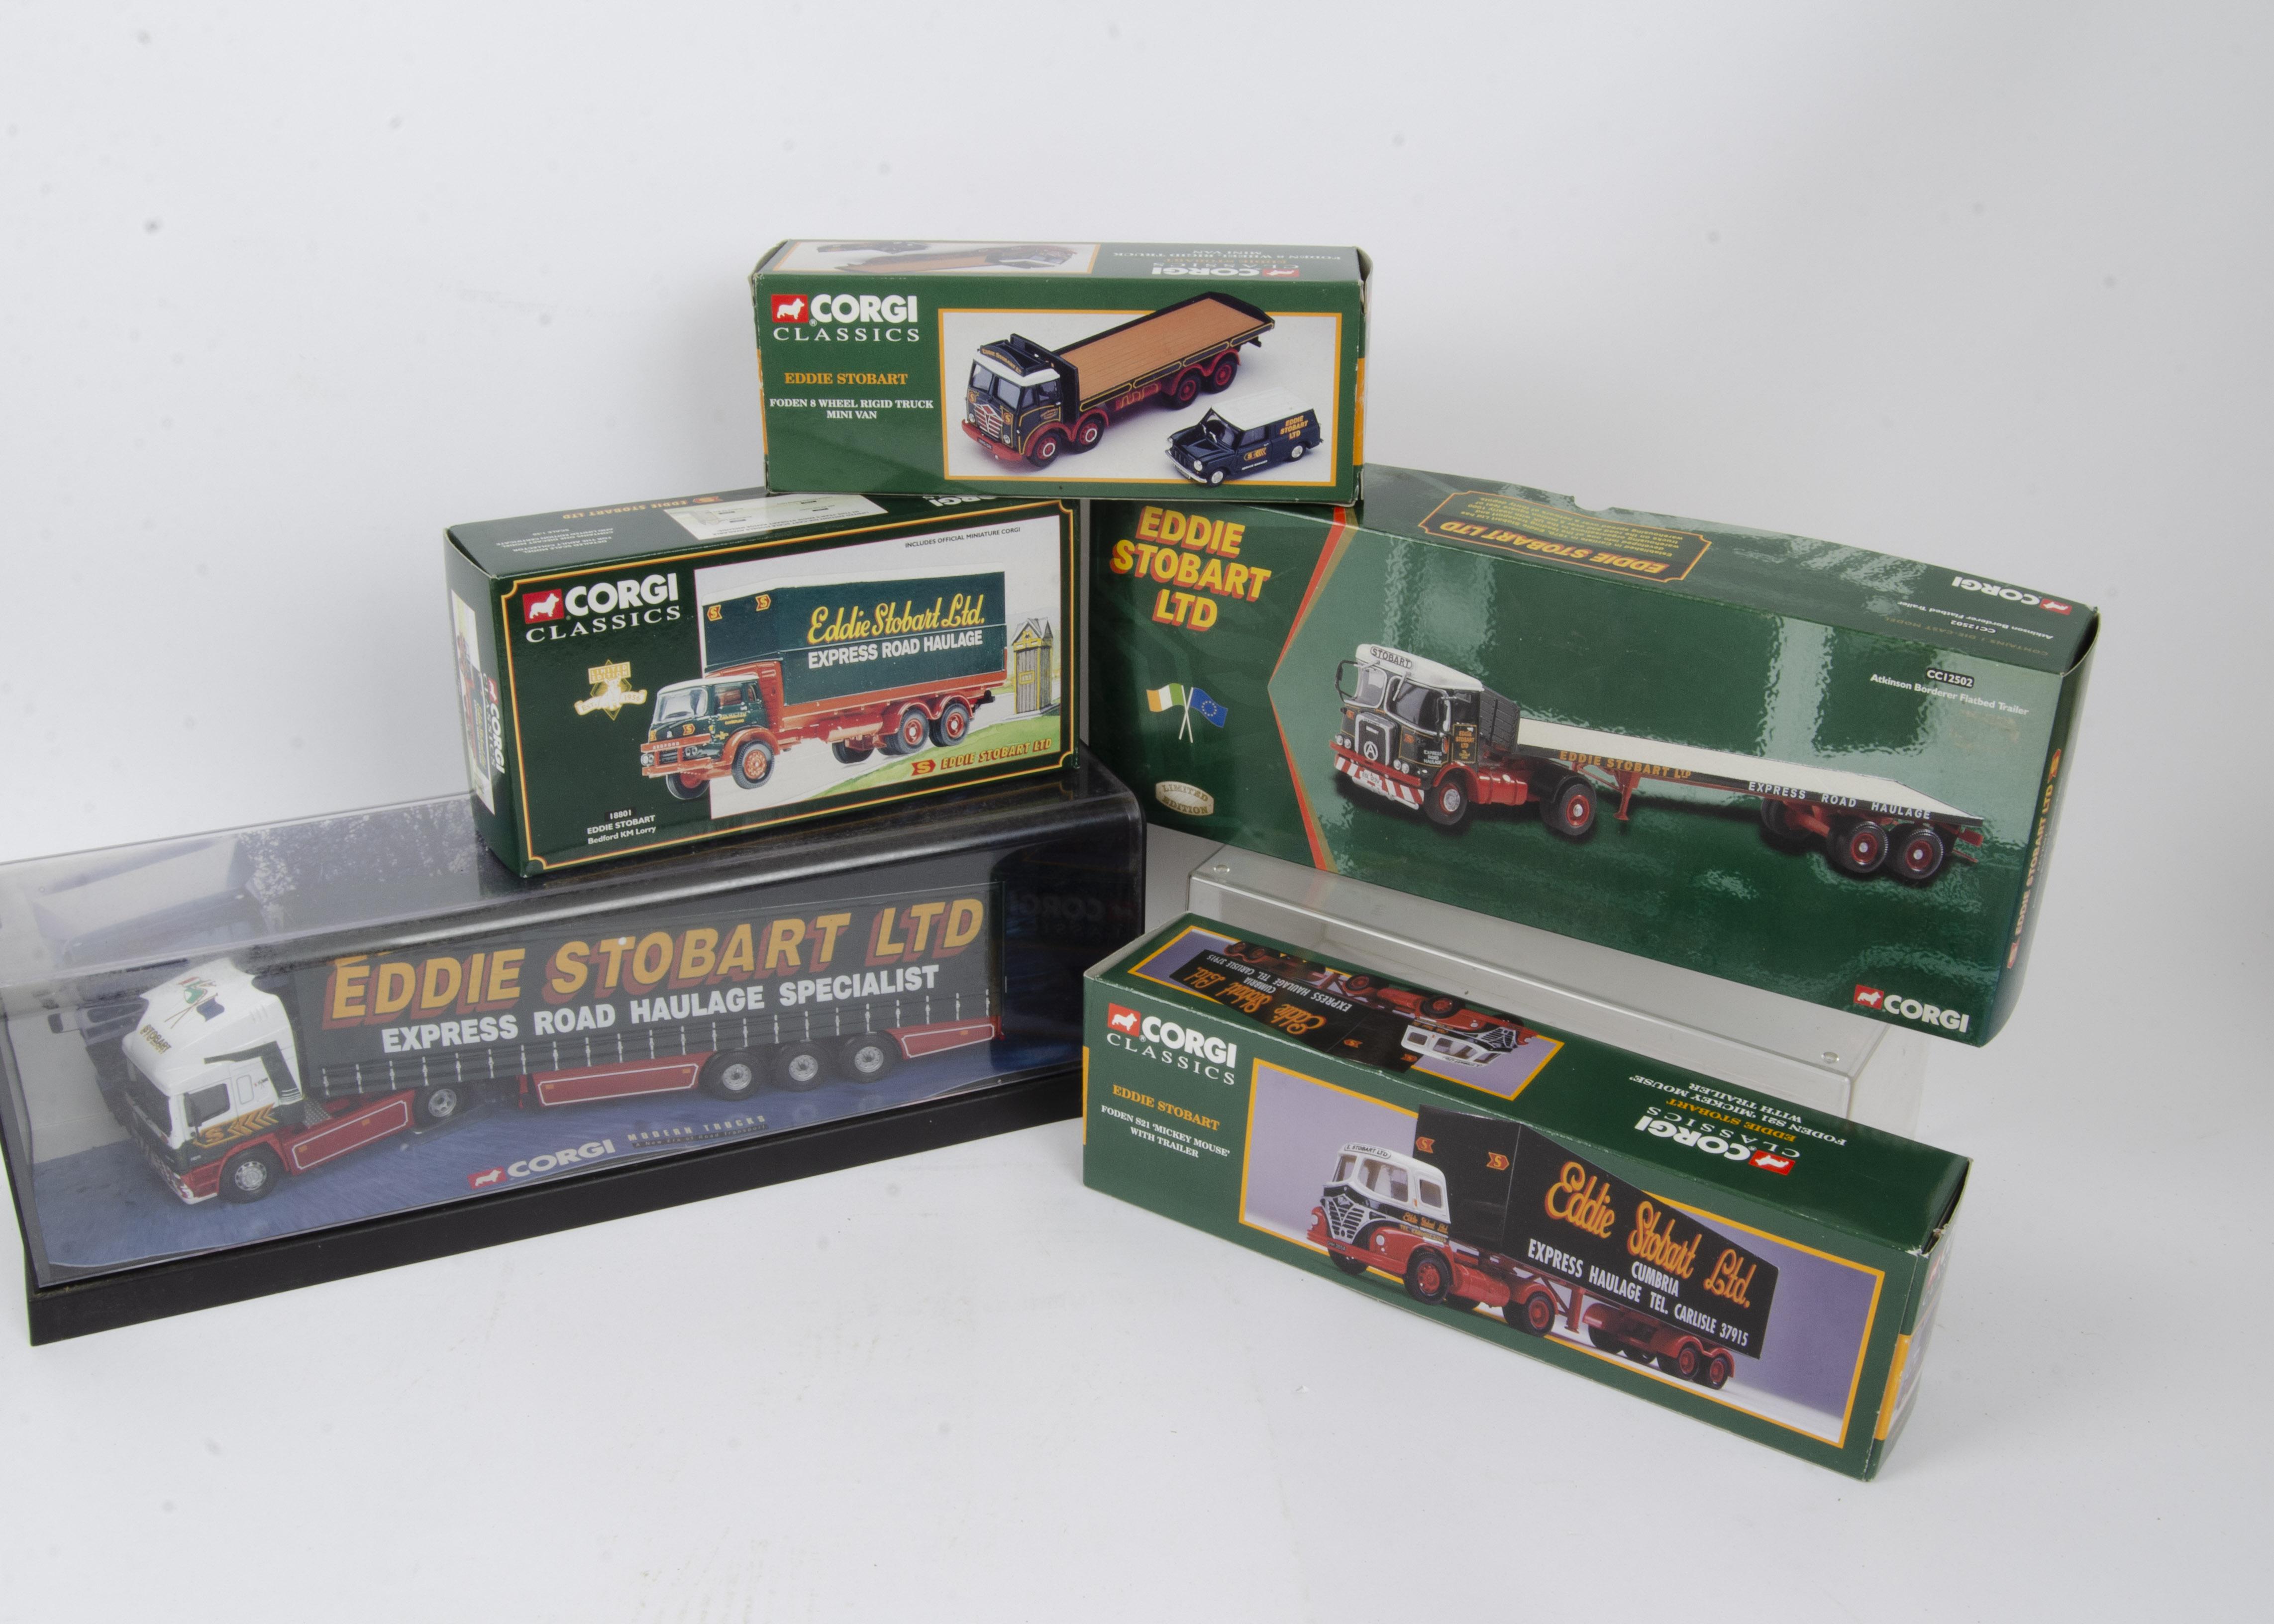 Corgi Classics Eddie Stobart, a boxed/cased group including, Modern Trucks in plastic case 75201 ERF